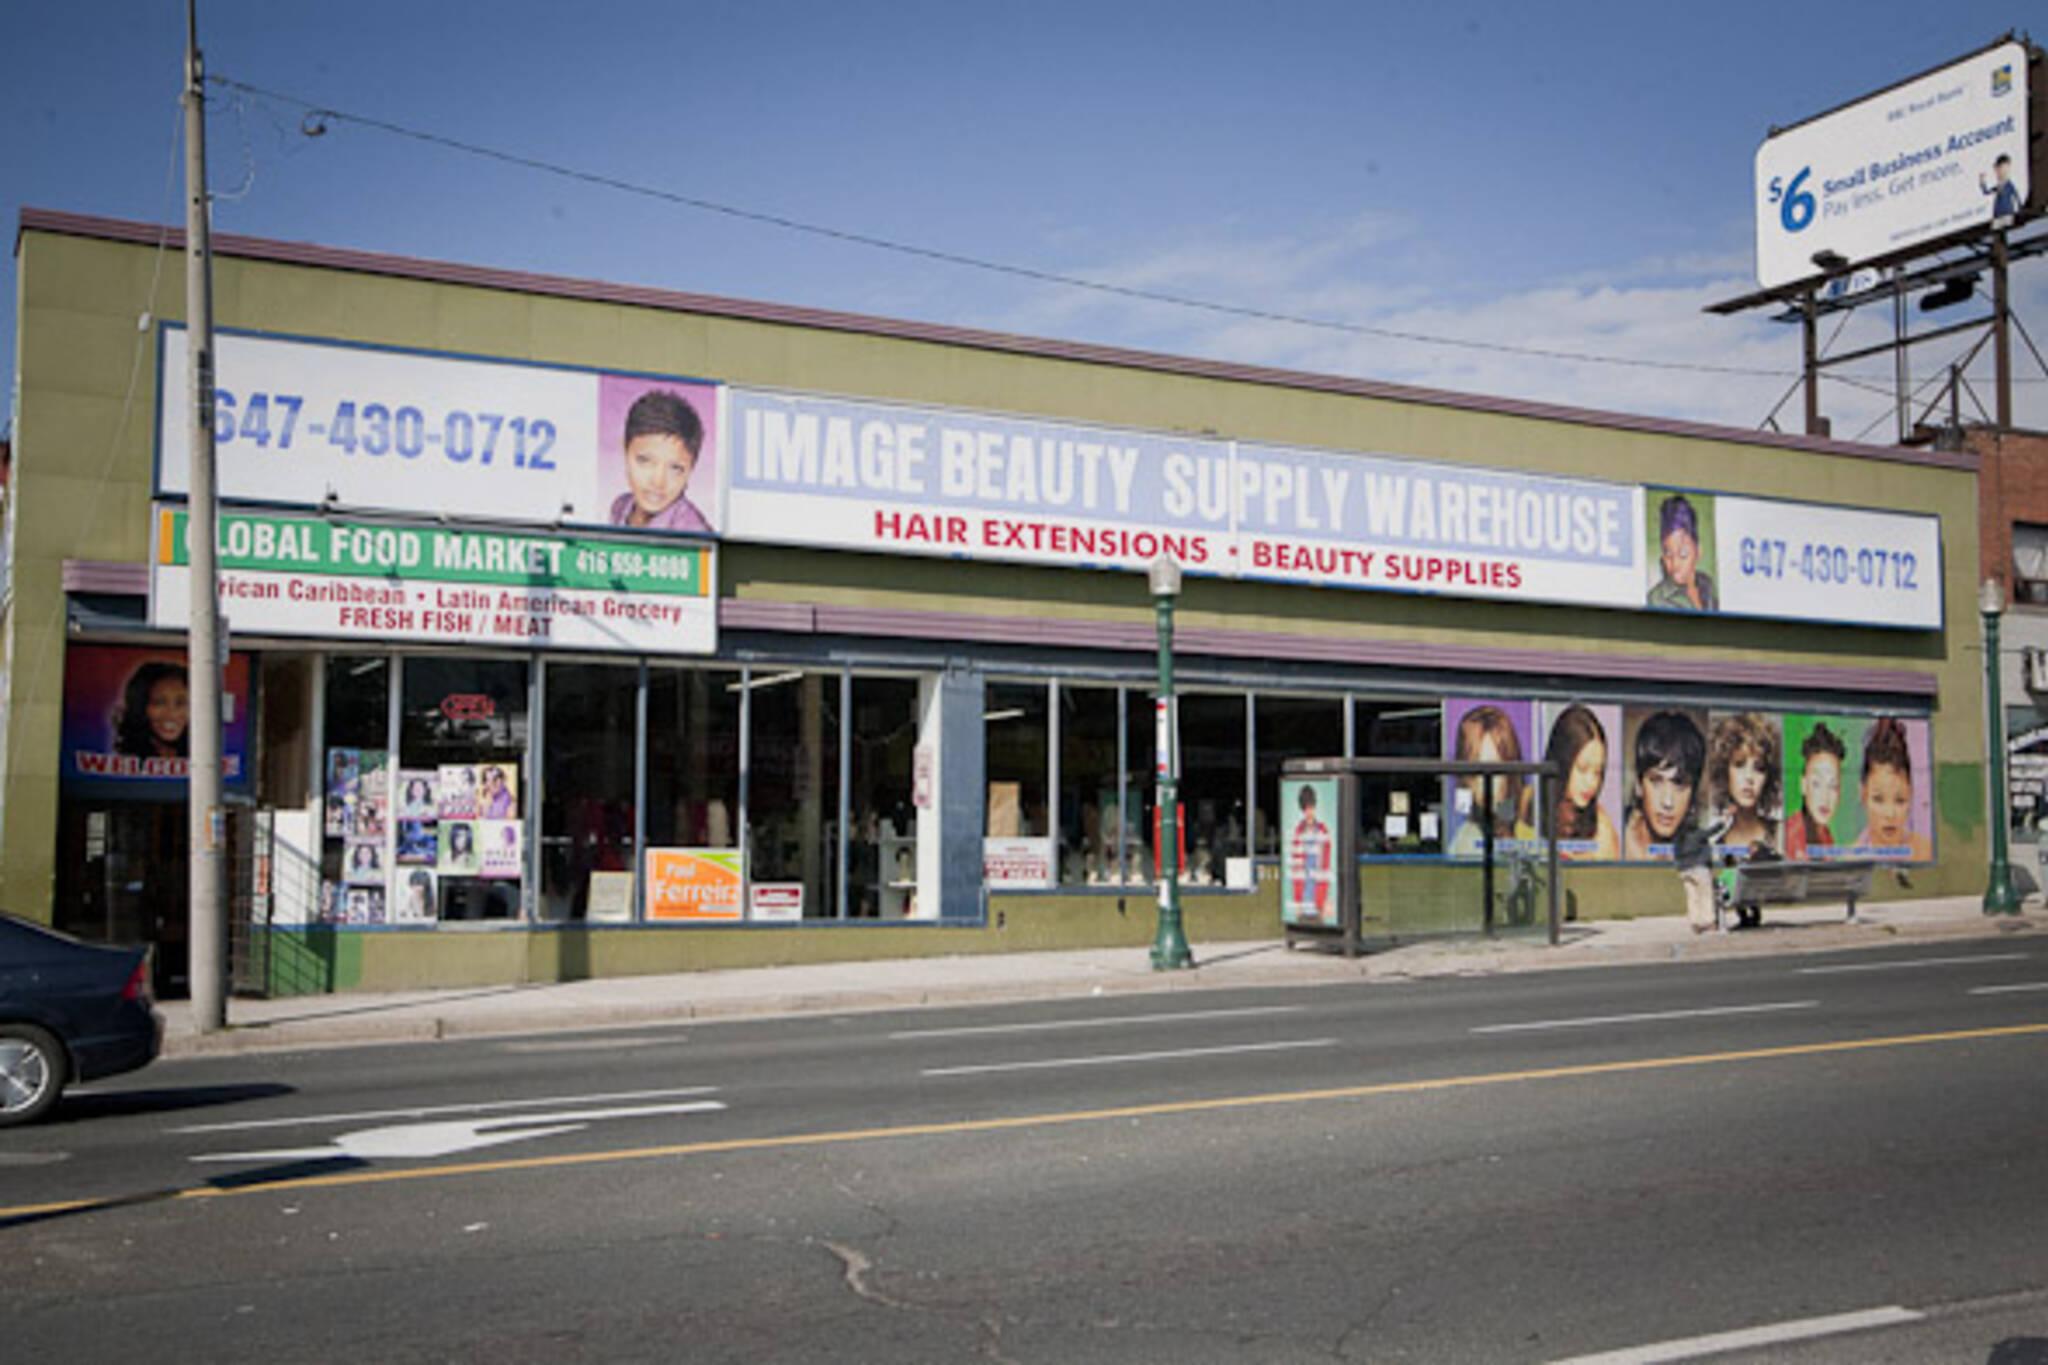 Image Beauty Supply Warehouse